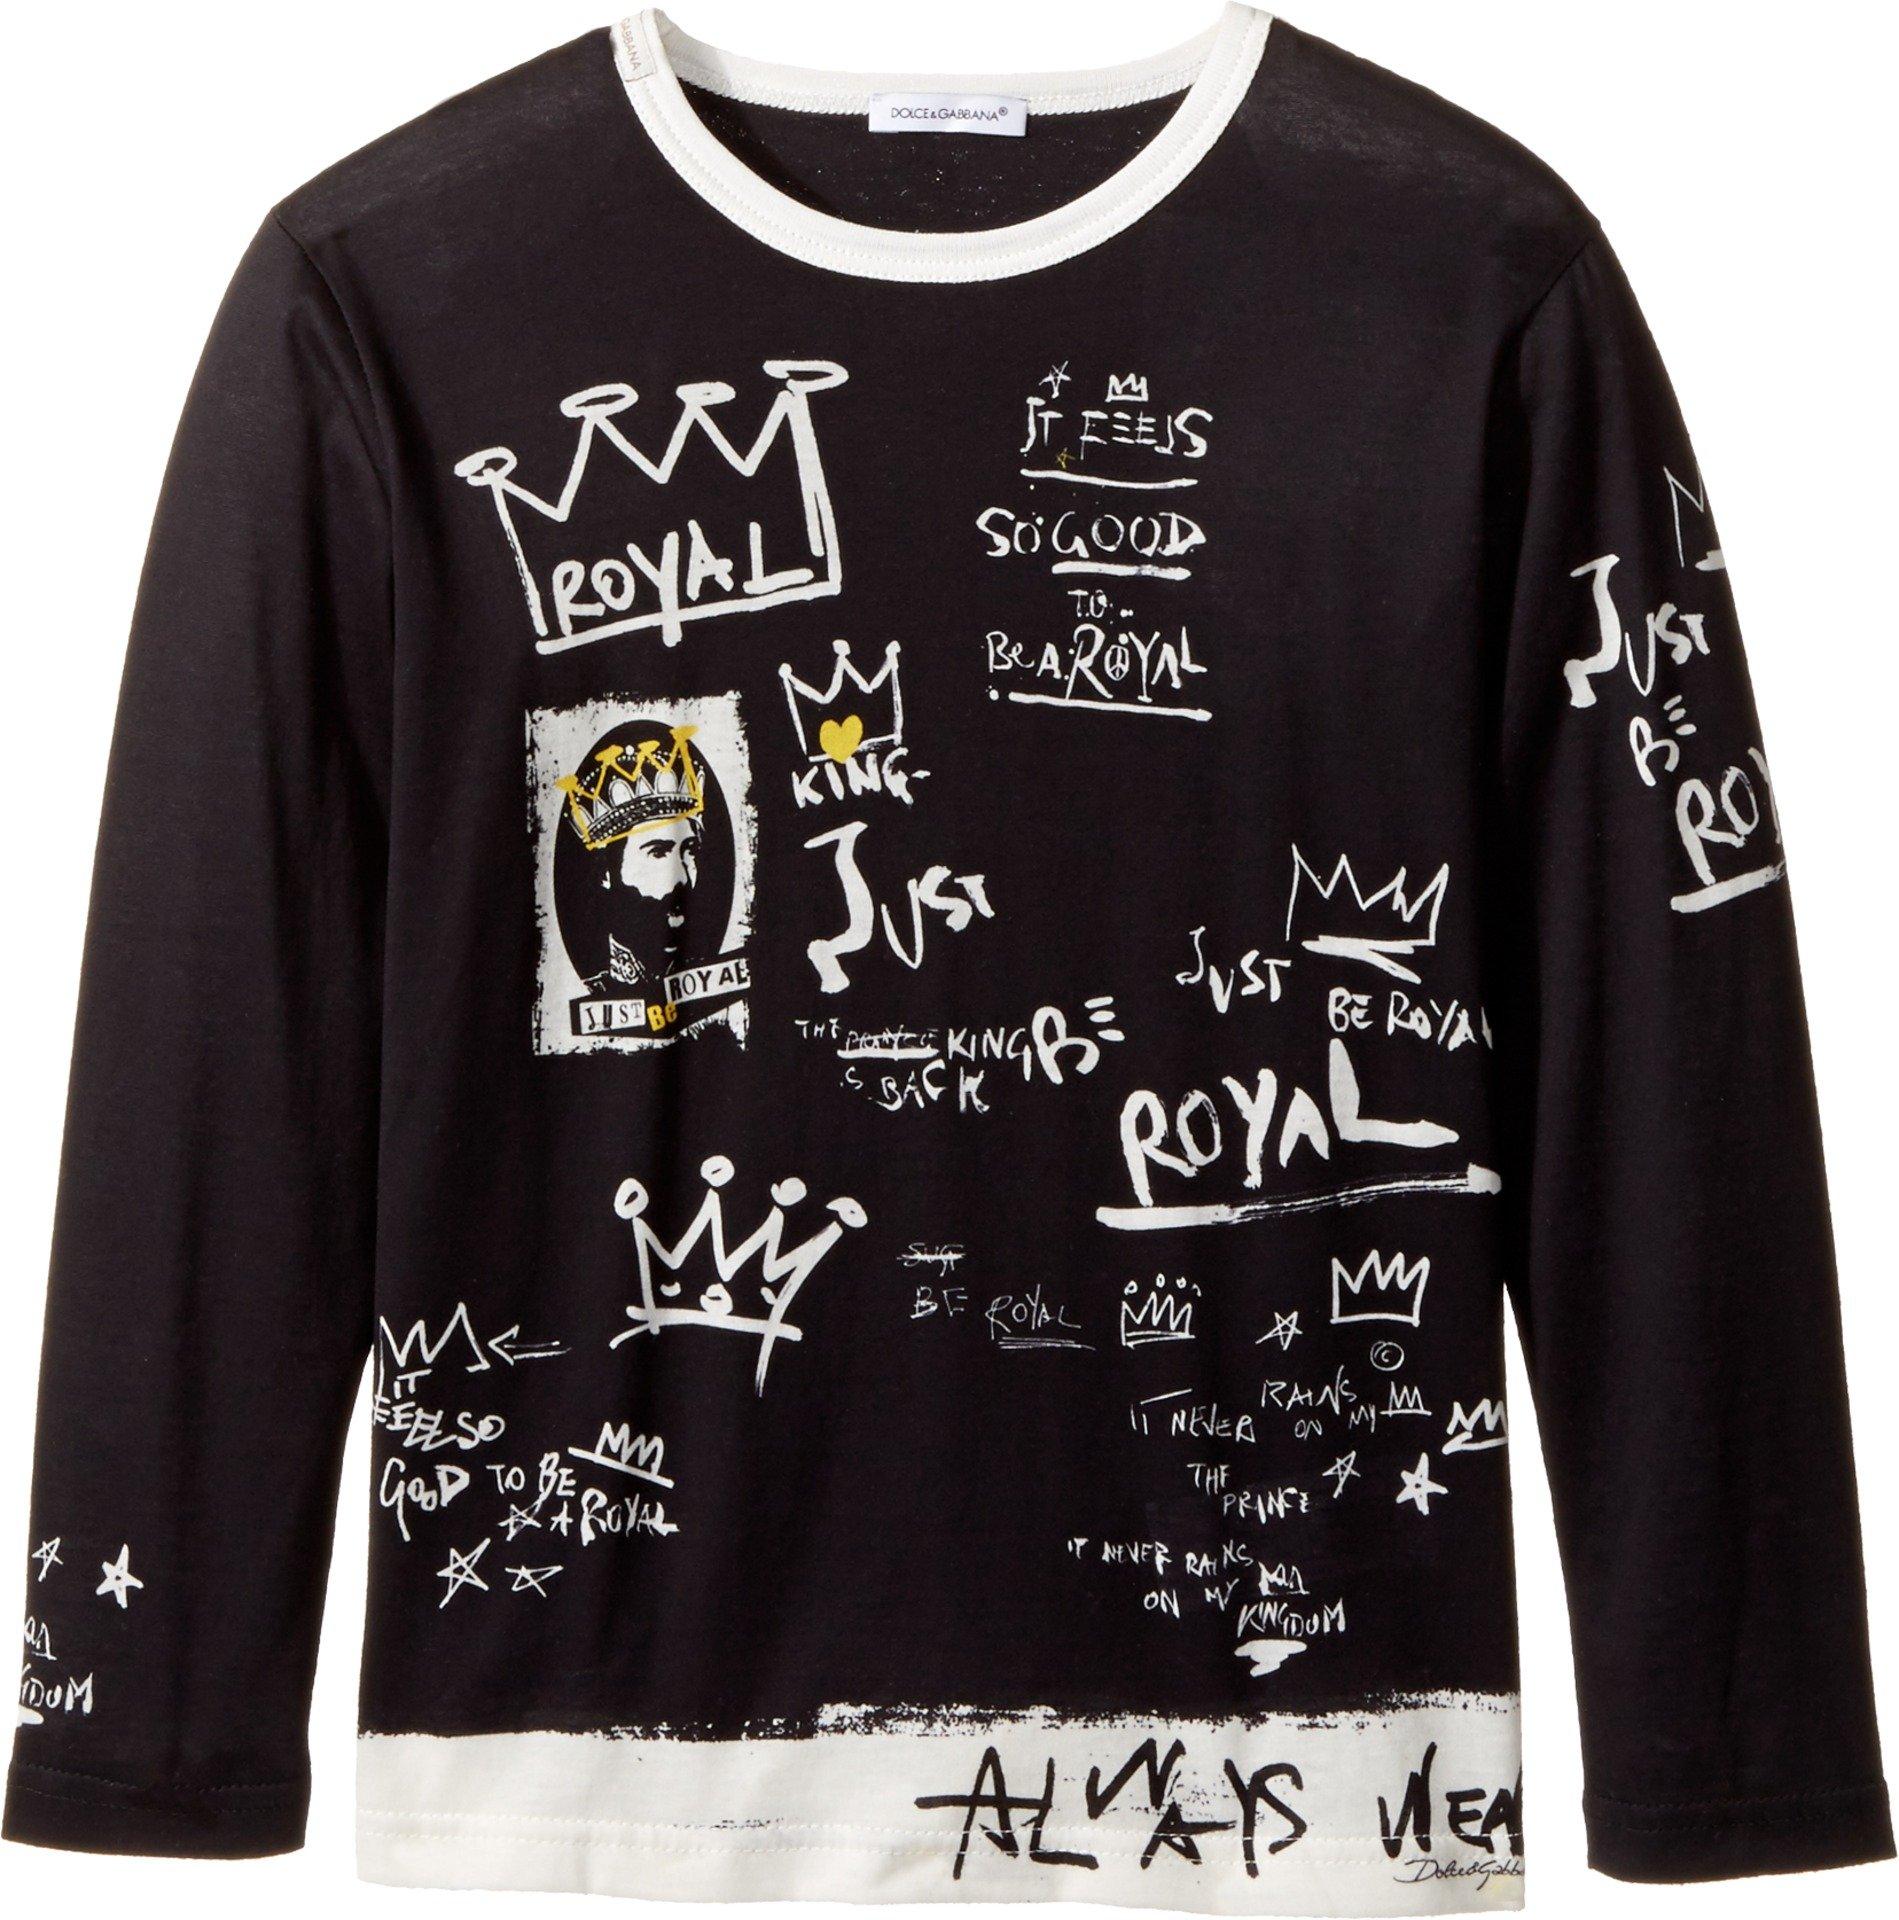 Dolce & Gabbana Kids  Baby Boy's Royal T-Shirt (Toddler/Little Kids) Black Print 6 by Dolce & Gabbana